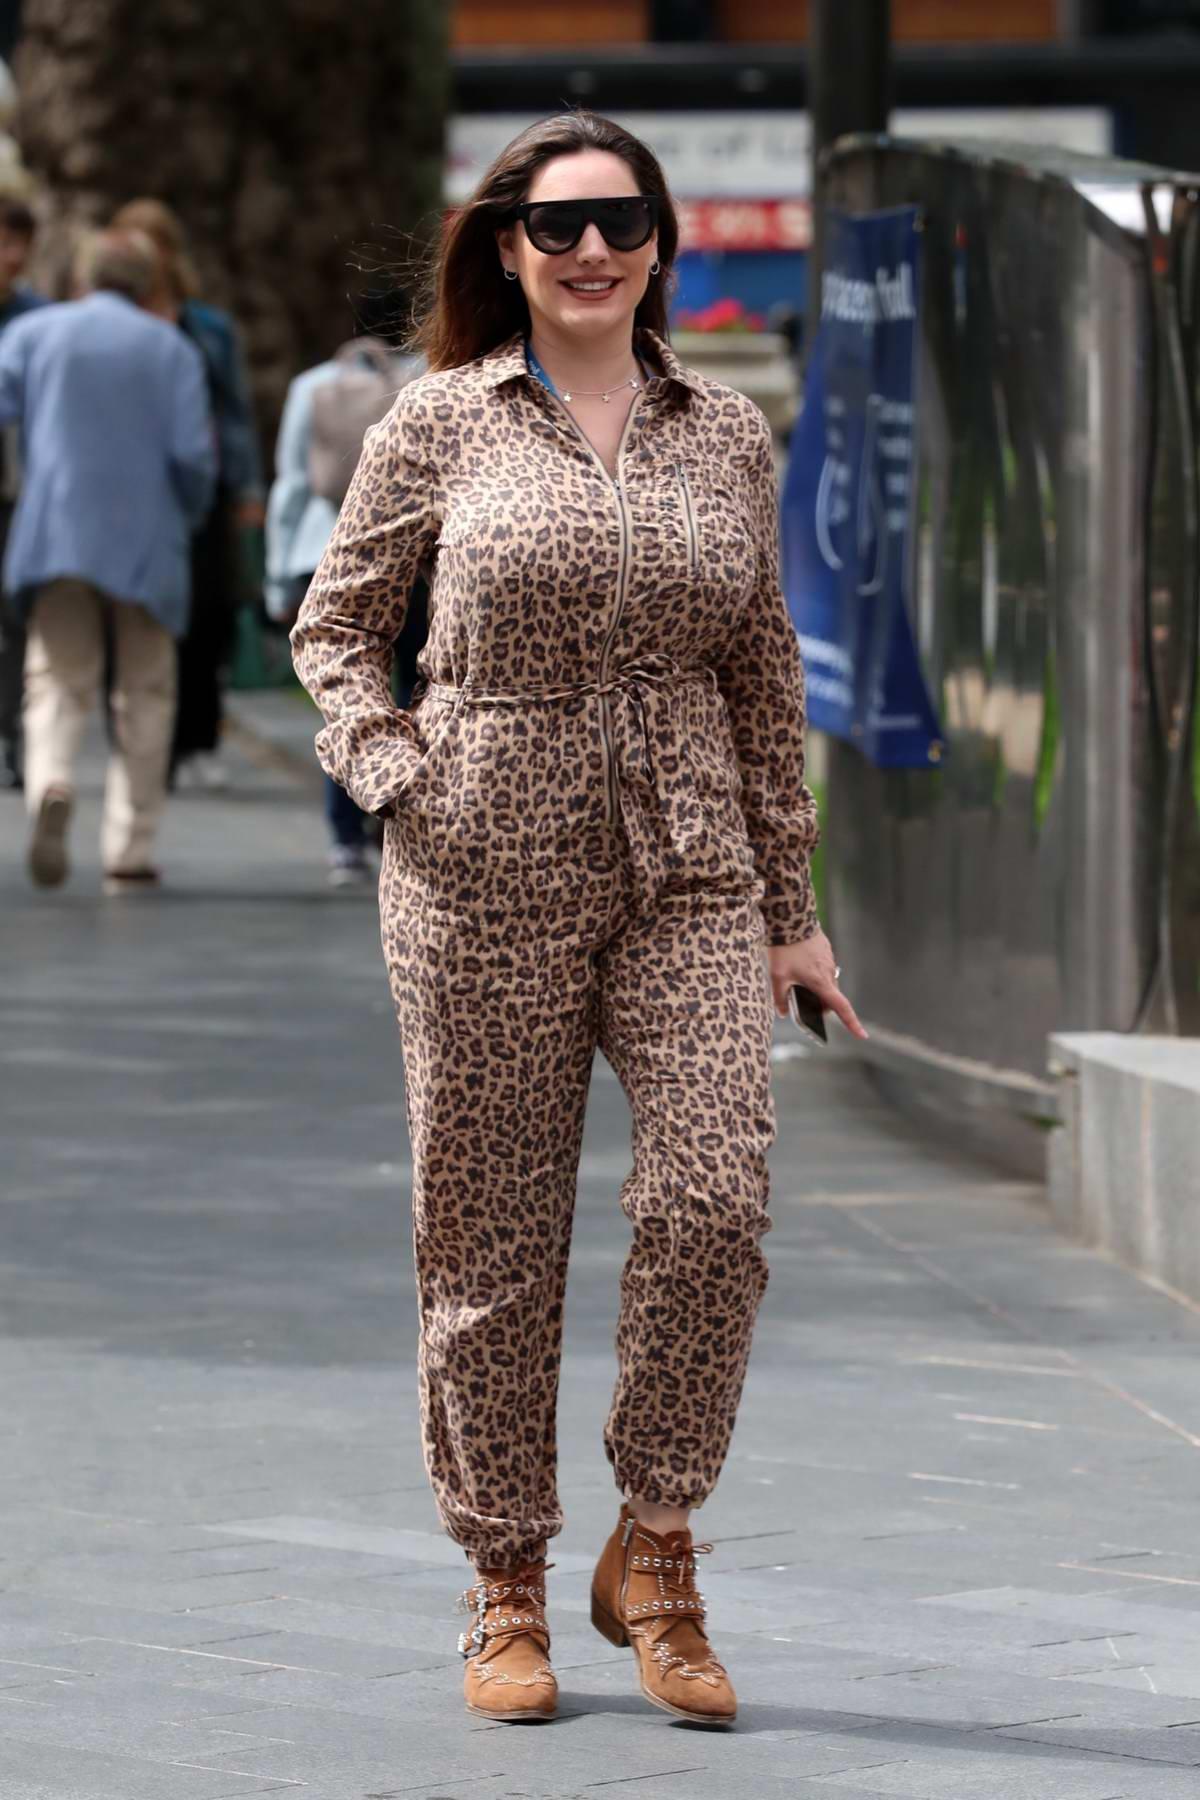 Kelly Brook arrives at Global Radio studios wearing an animal print jumpsuit in London, UK